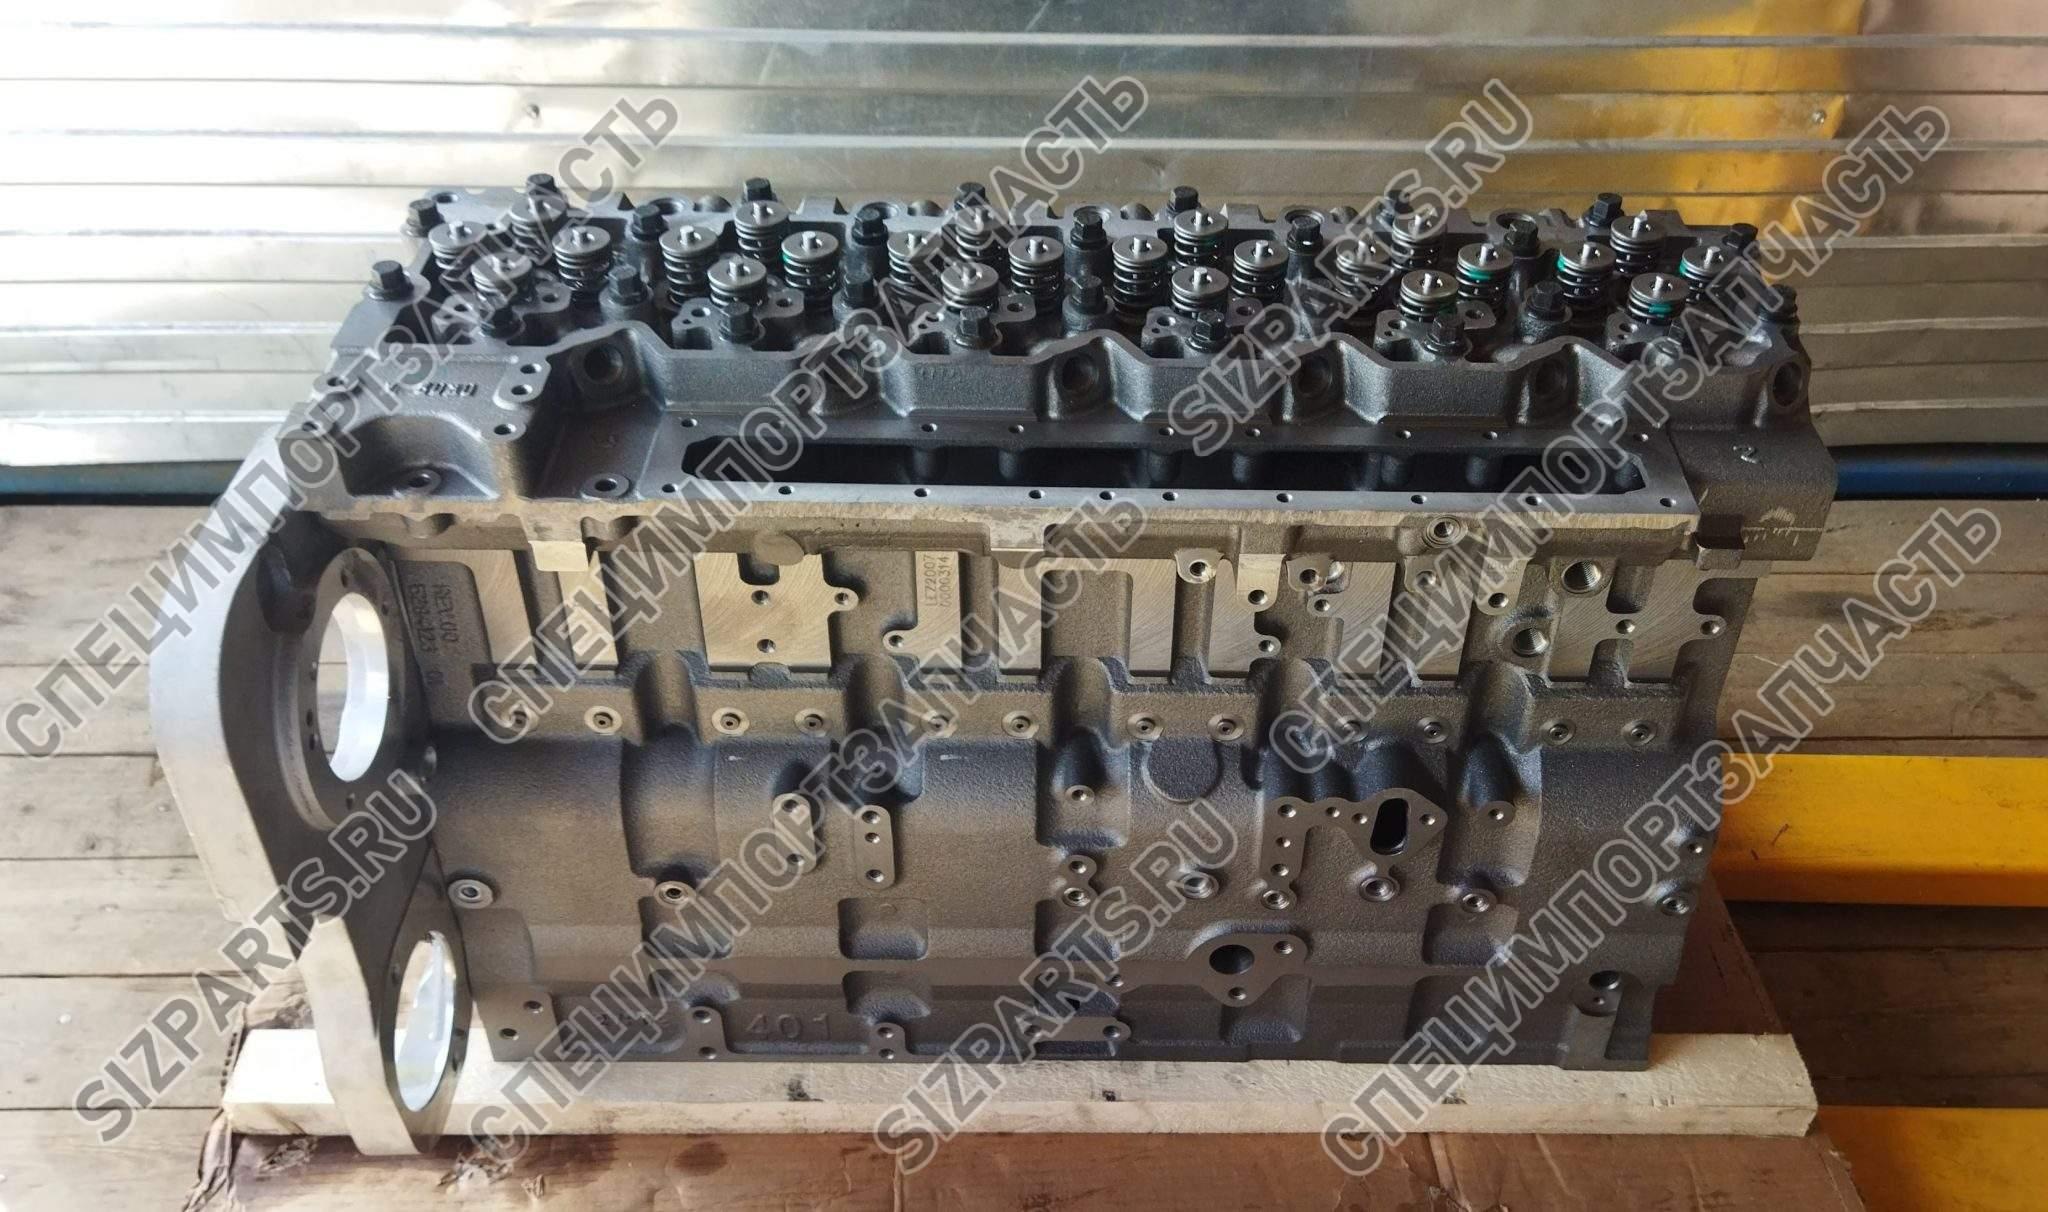 Cборка лонг-блока для экскаватора Komatsu PC300-8 (ЭО-4227) 1